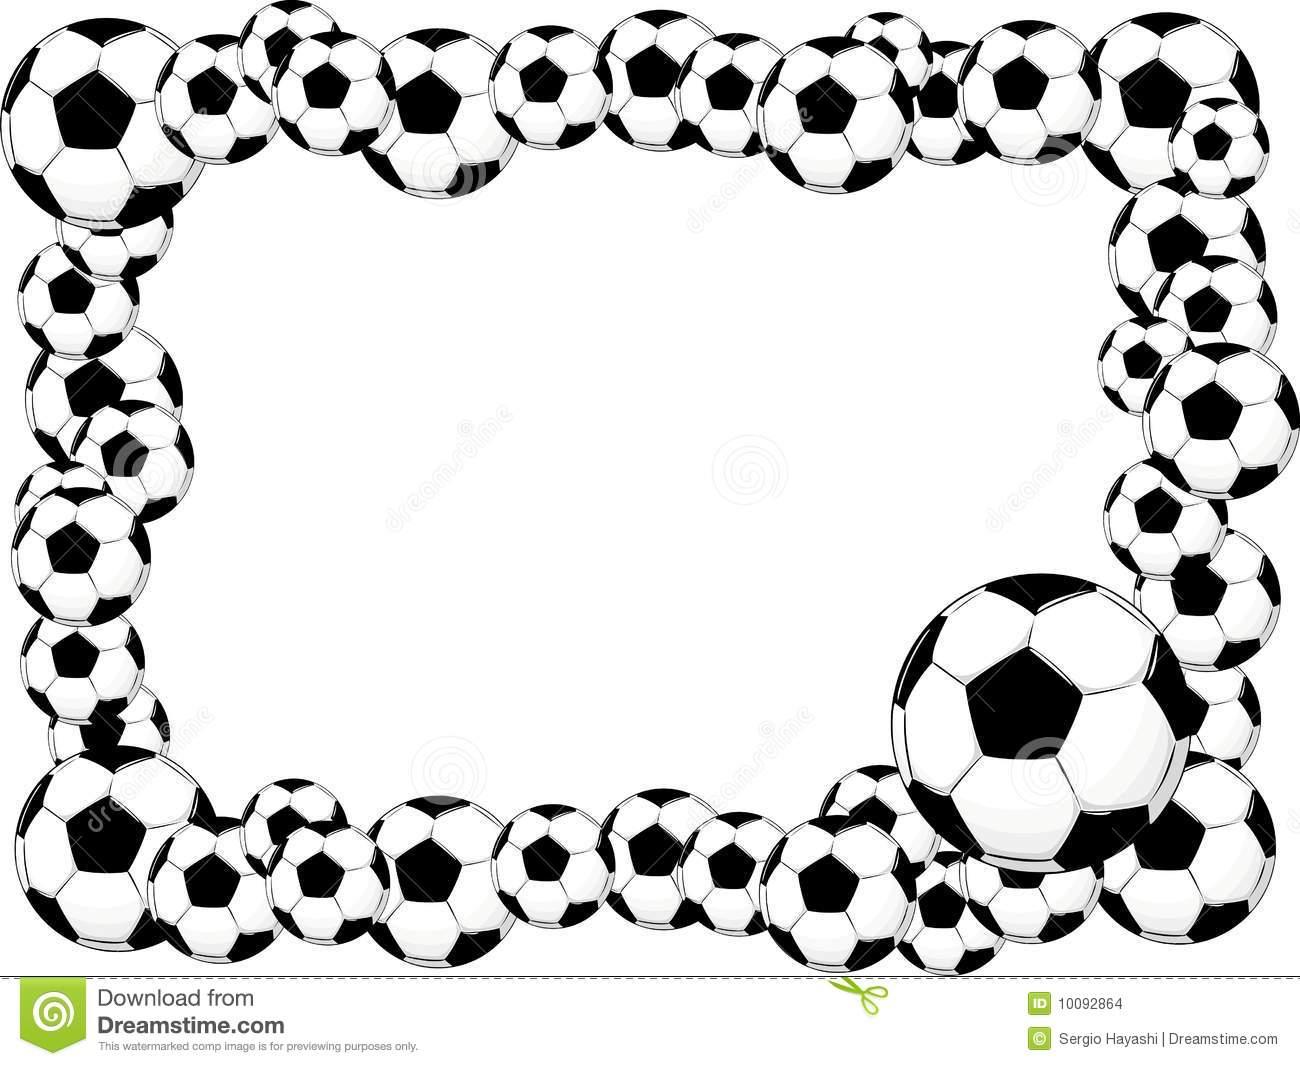 Balls clipart border. Soccer ball